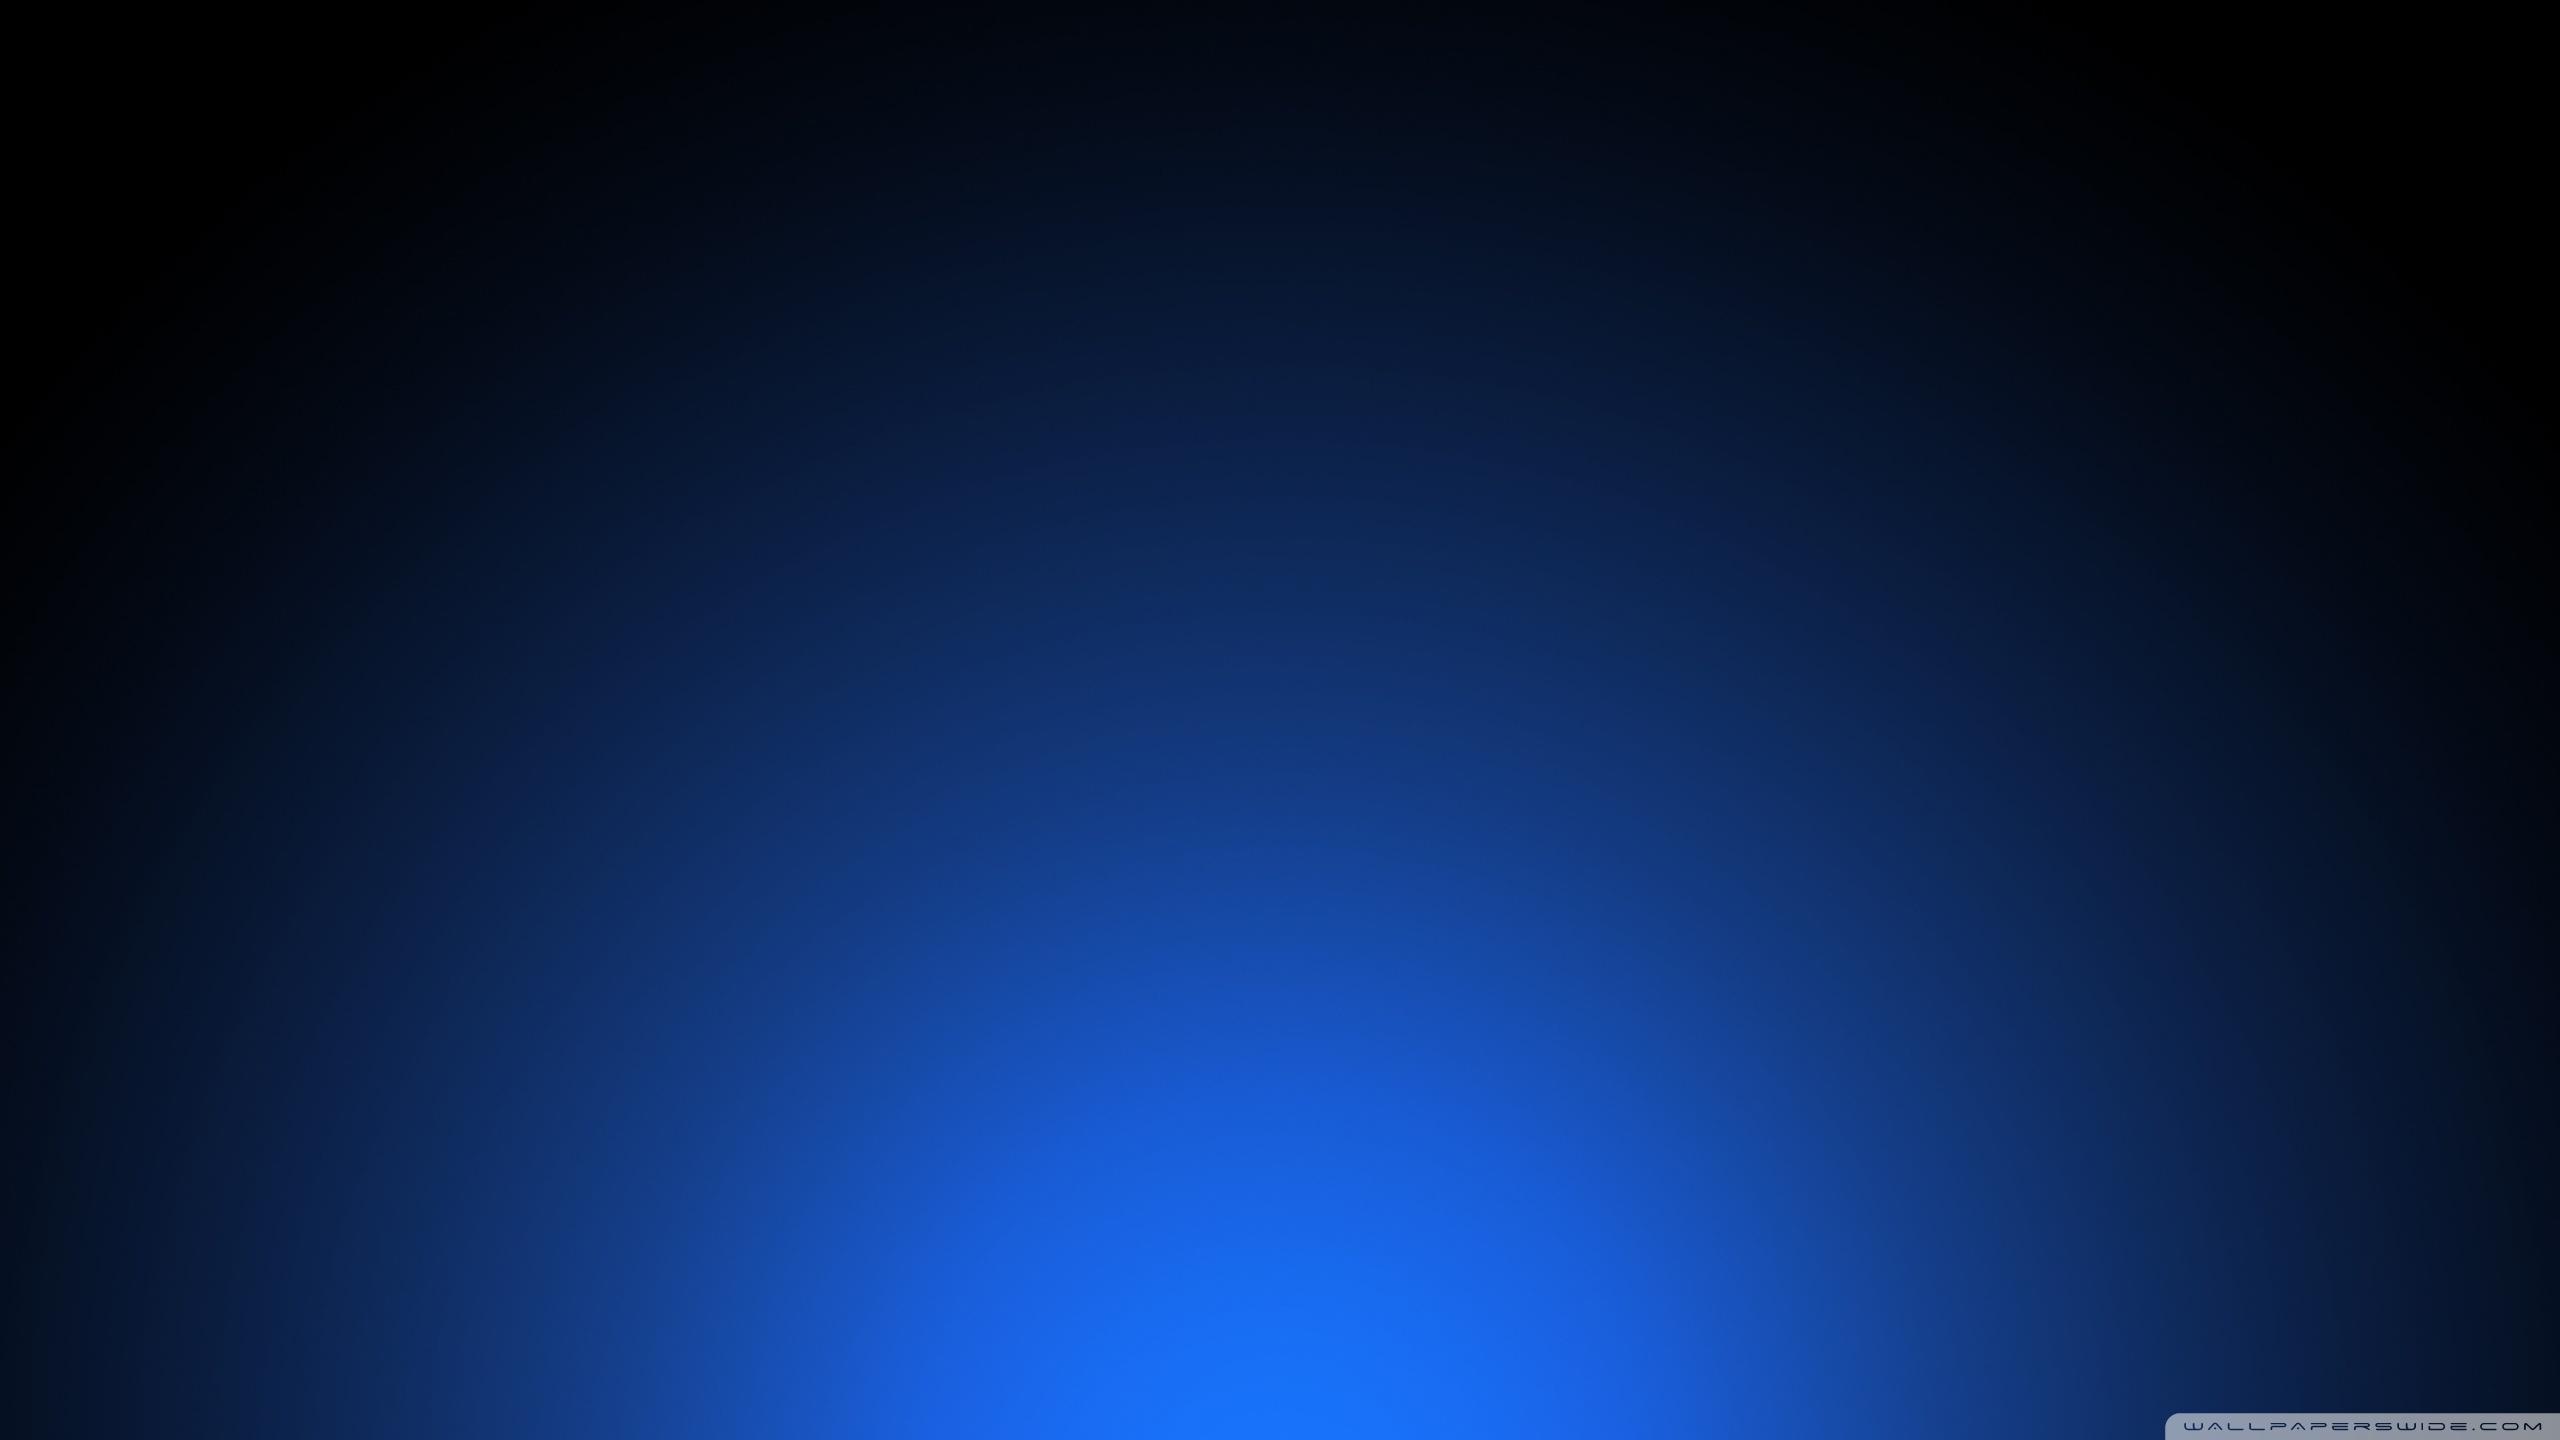 simple blue & black wallpaper ❤ 4k hd desktop wallpaper for 4k